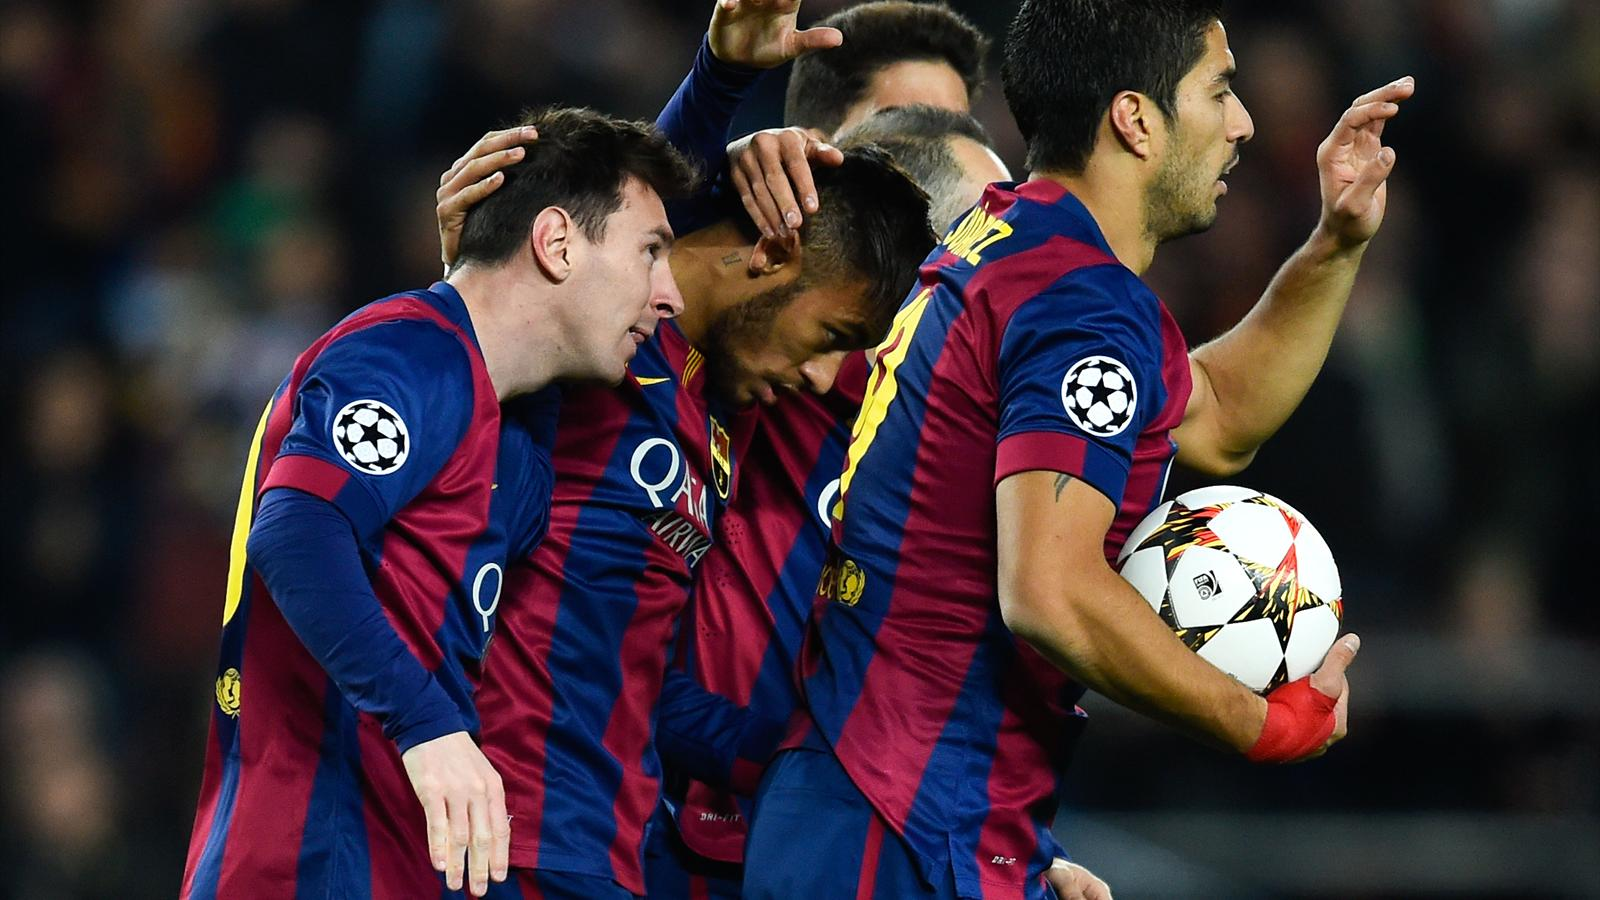 Messi And Neymar Suarez Wallpaper 4 1600x900